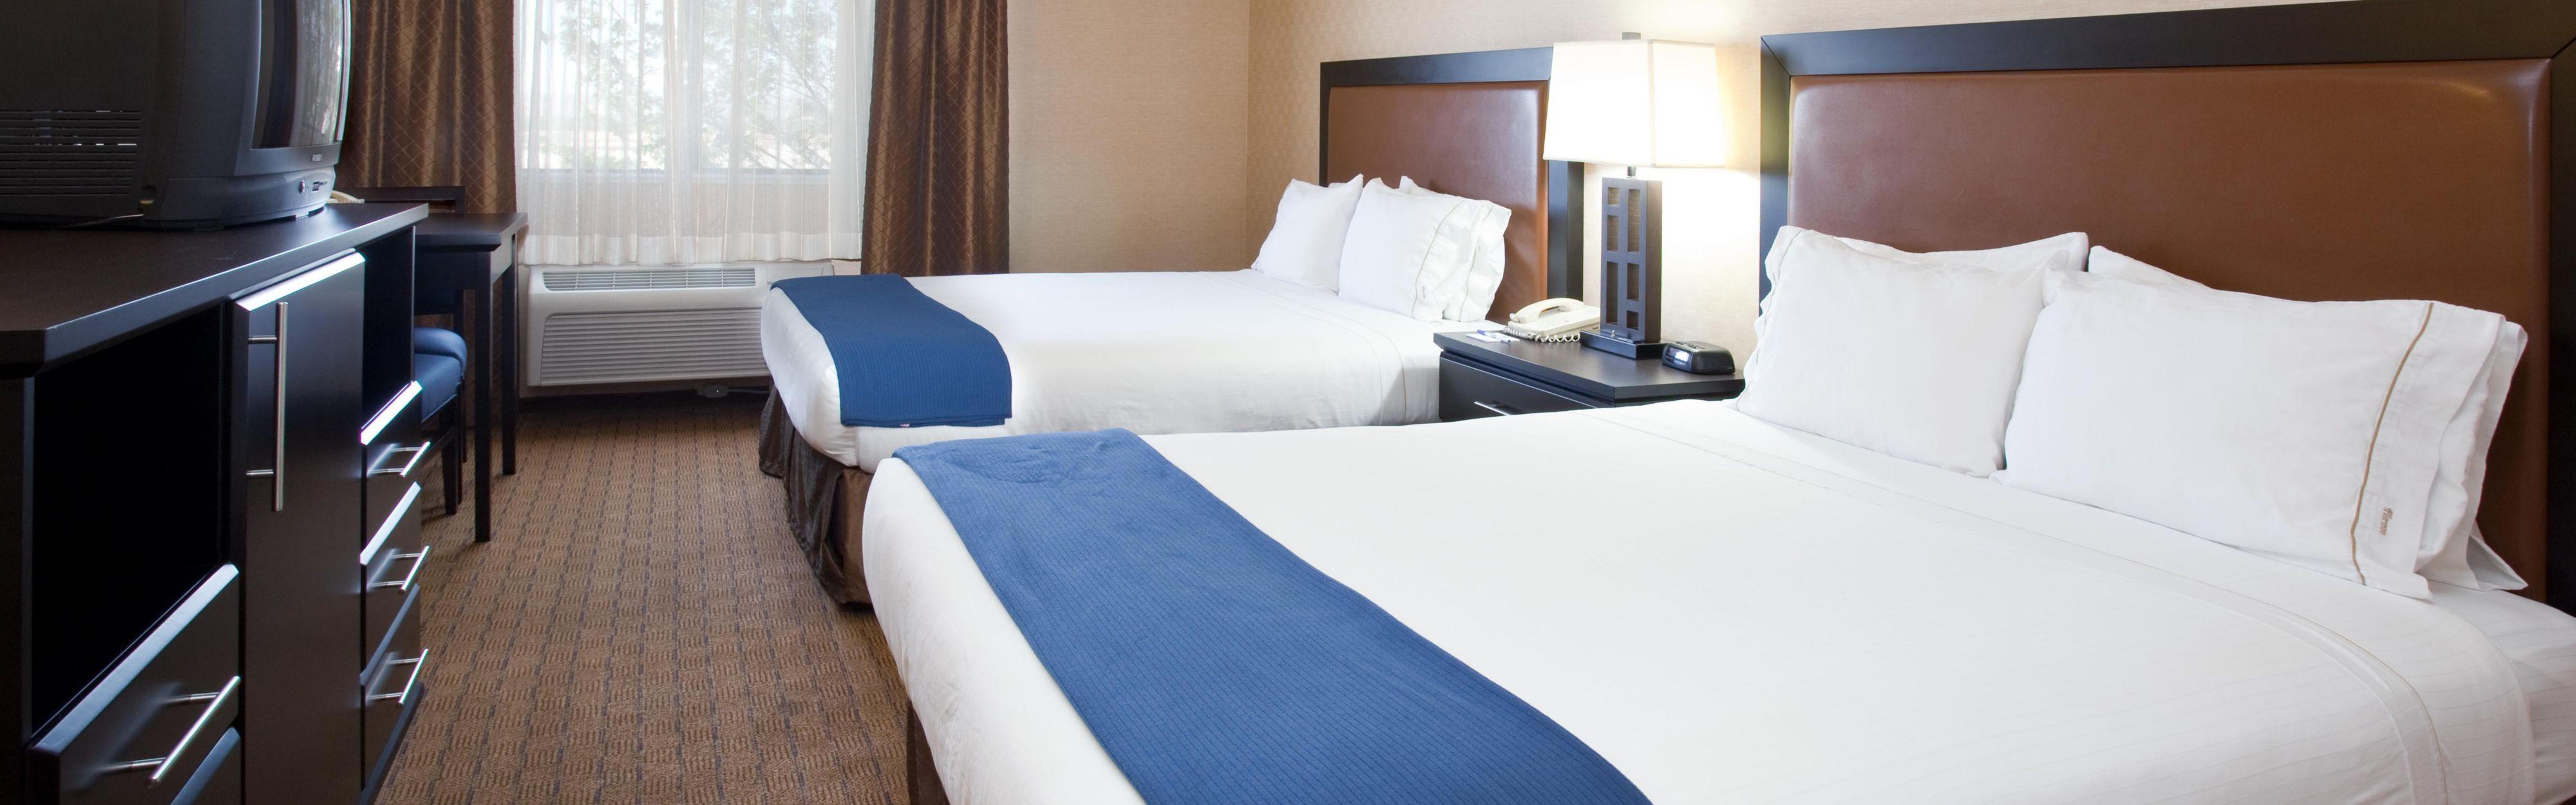 Holiday Inn Express & Suites Albuquerque-N. Balloon Fsta Pk image 1